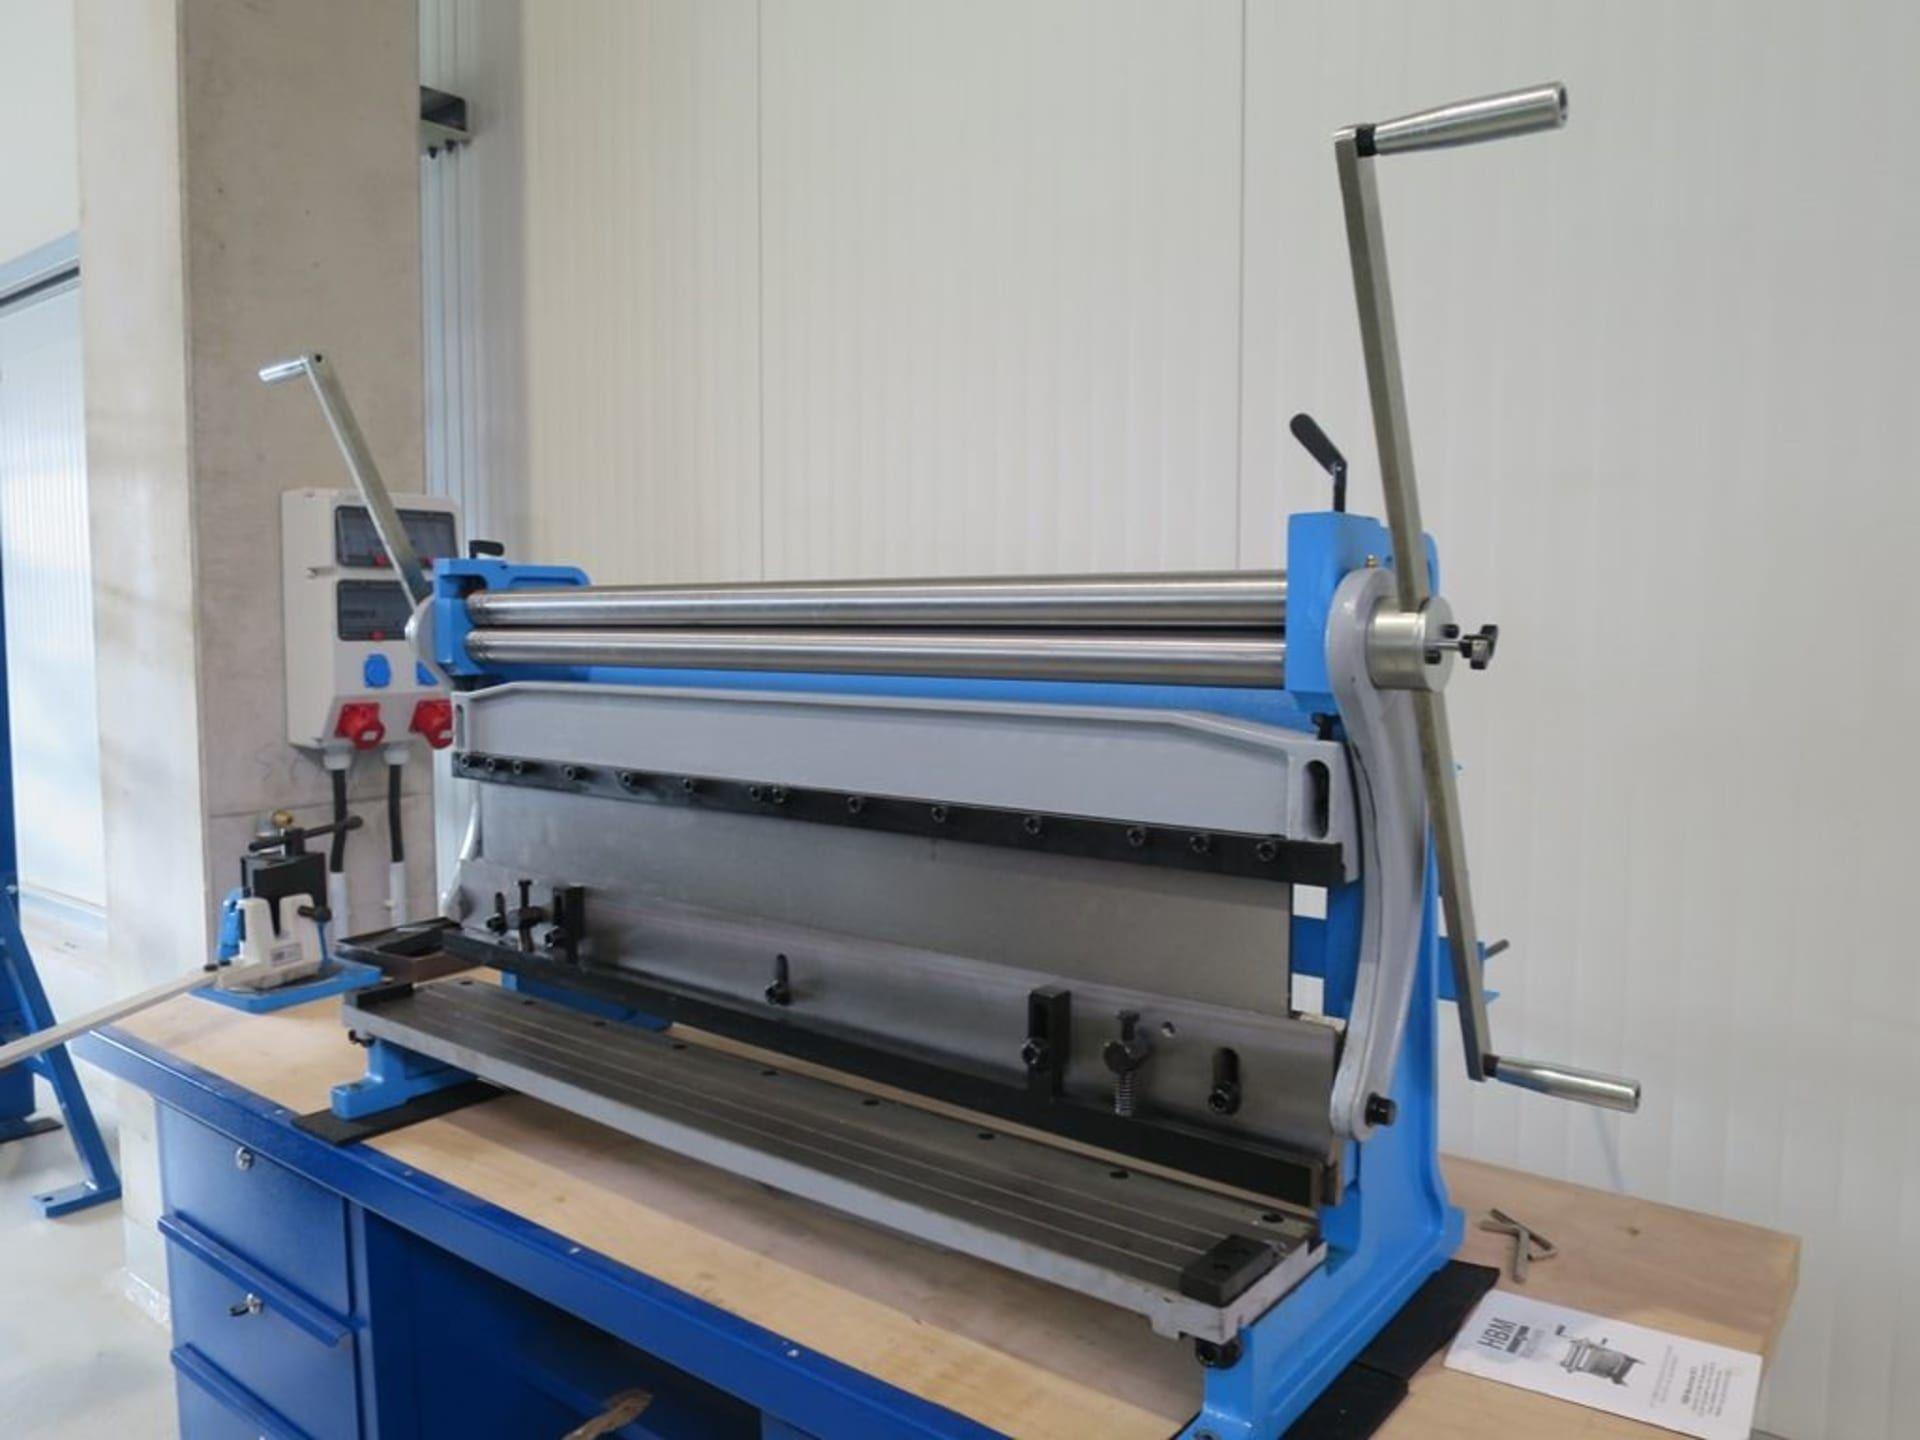 HBM 1015-1 Kombi-Blechmaschine